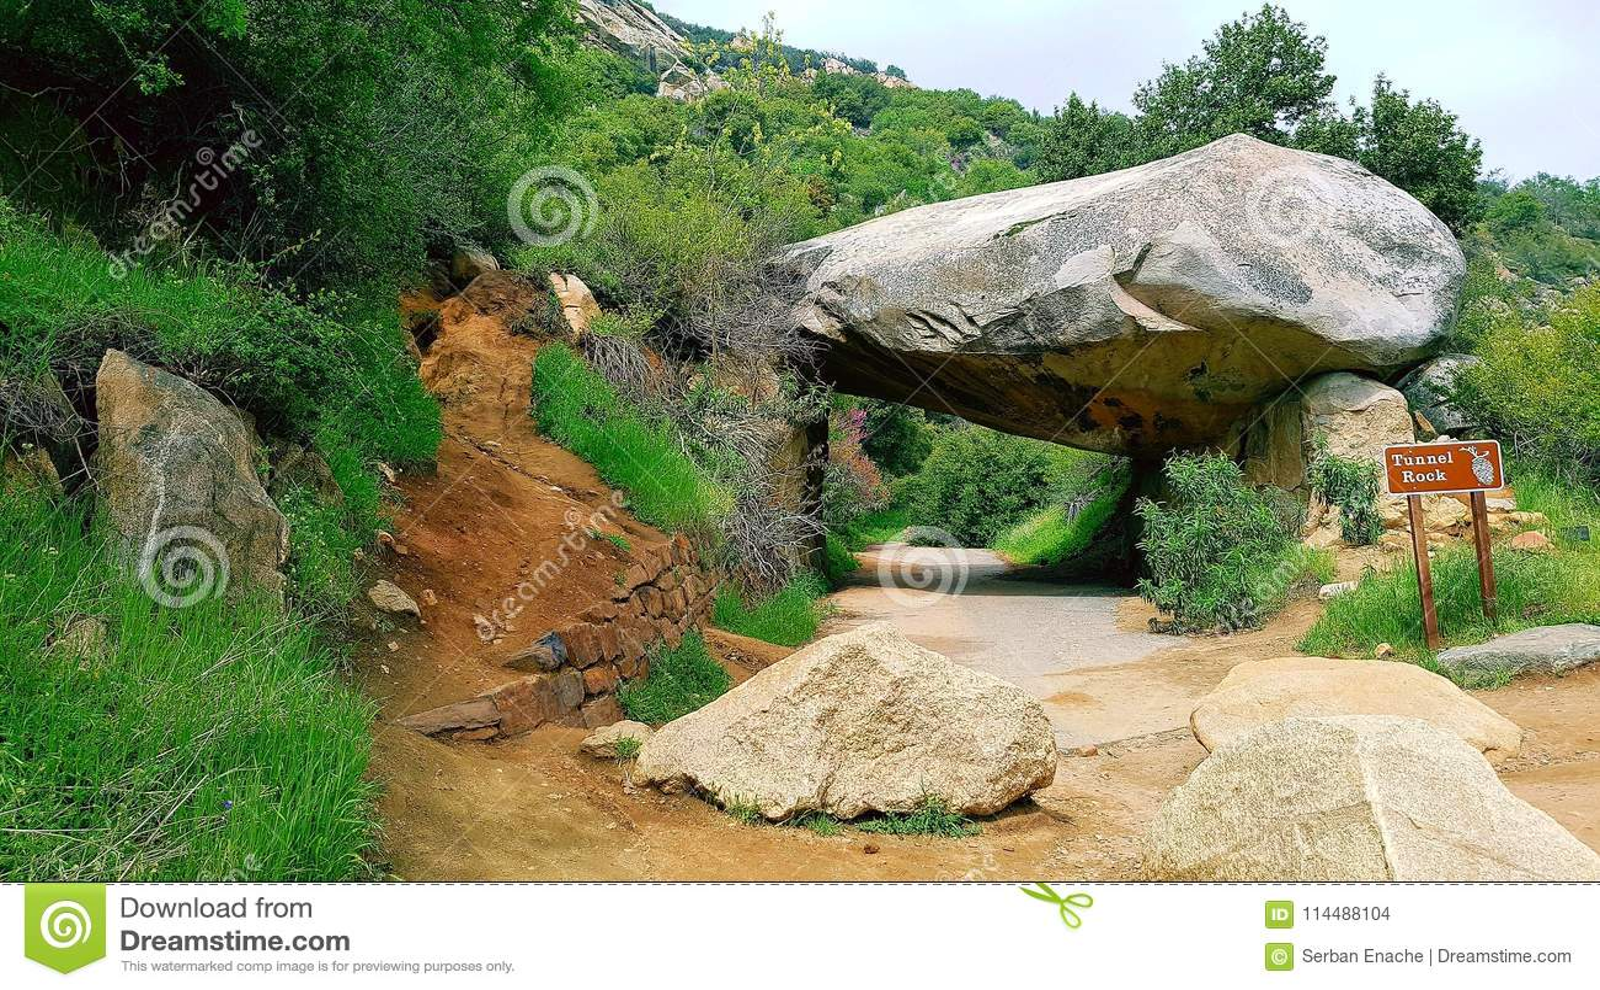 Tunnel Rock